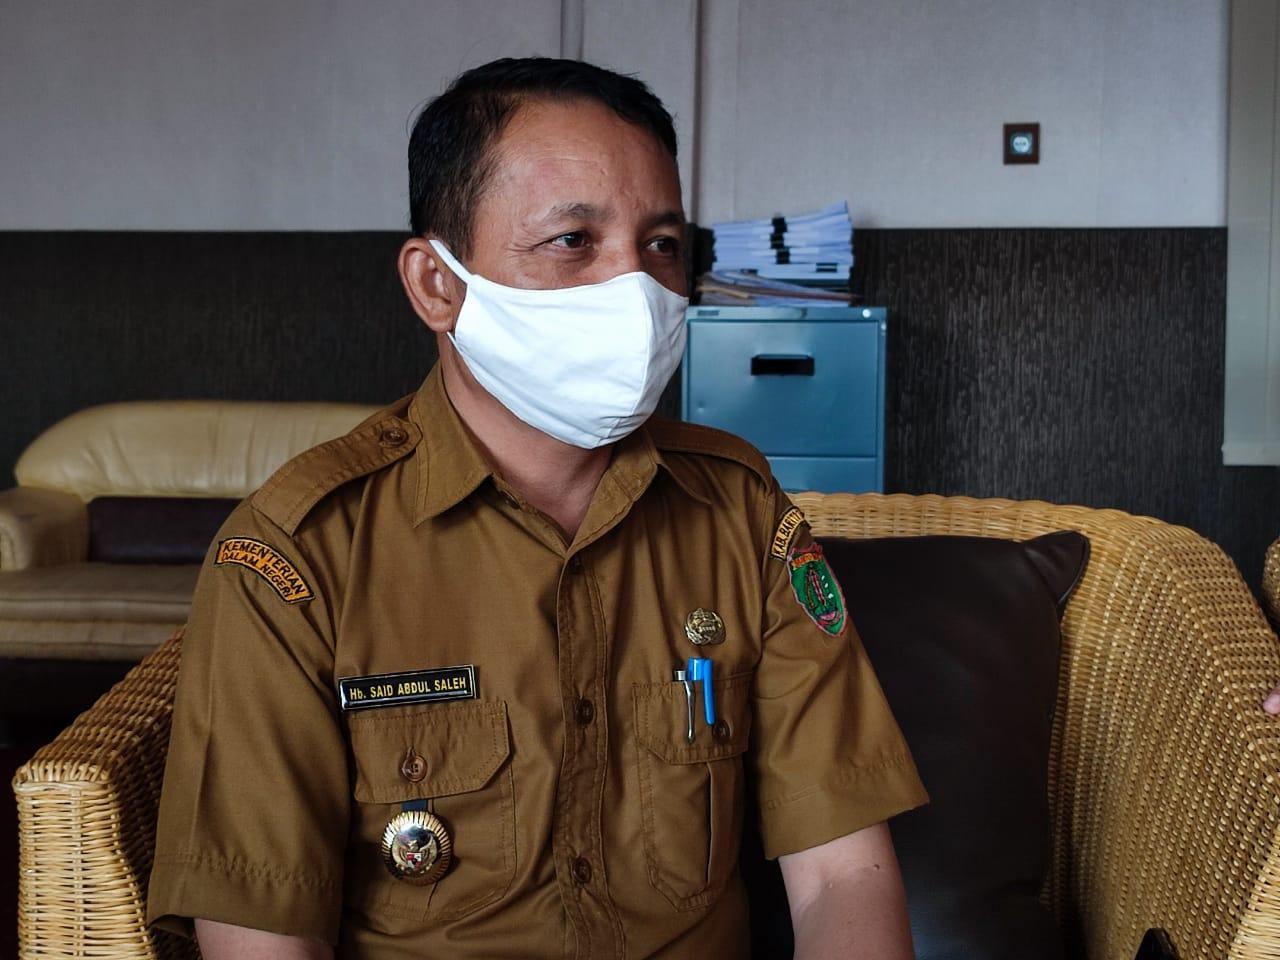 Wakil Bupati Barito Timur Provinsi Kalimantan Tengah, Habib Said Abdul Saleh